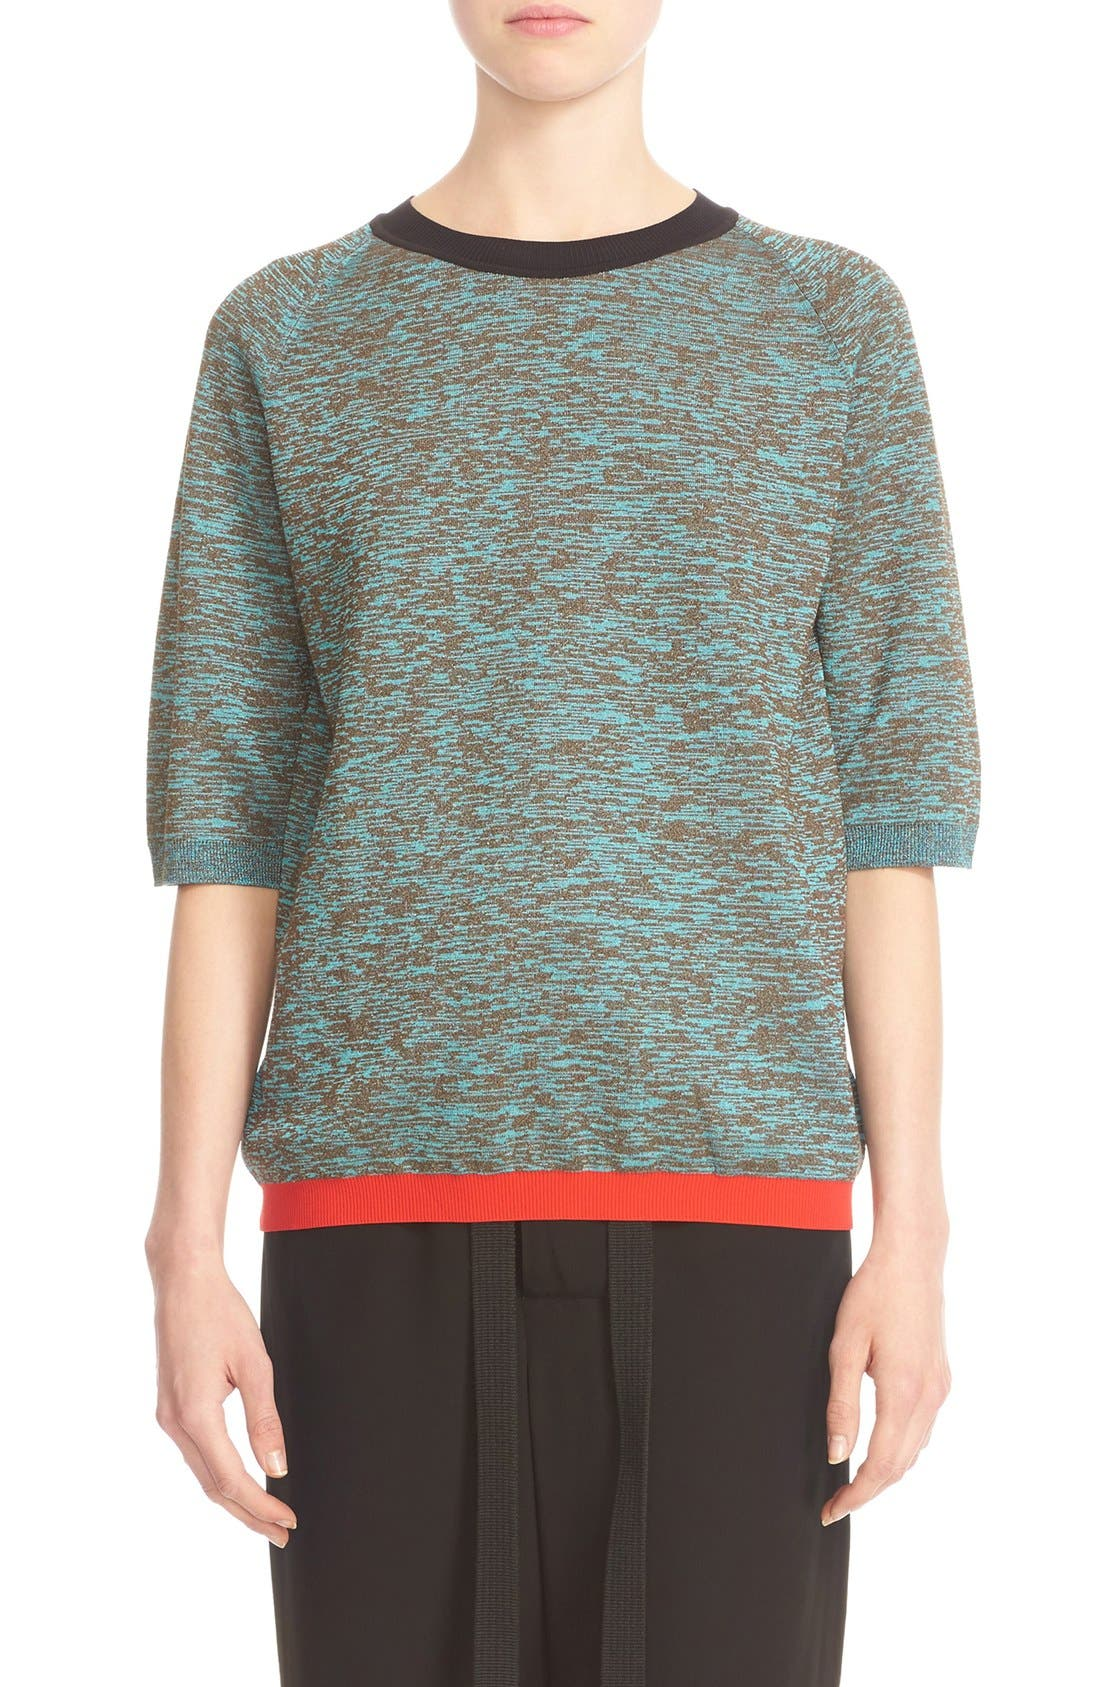 MARNI Contrast Trim Wool Blend Sweater